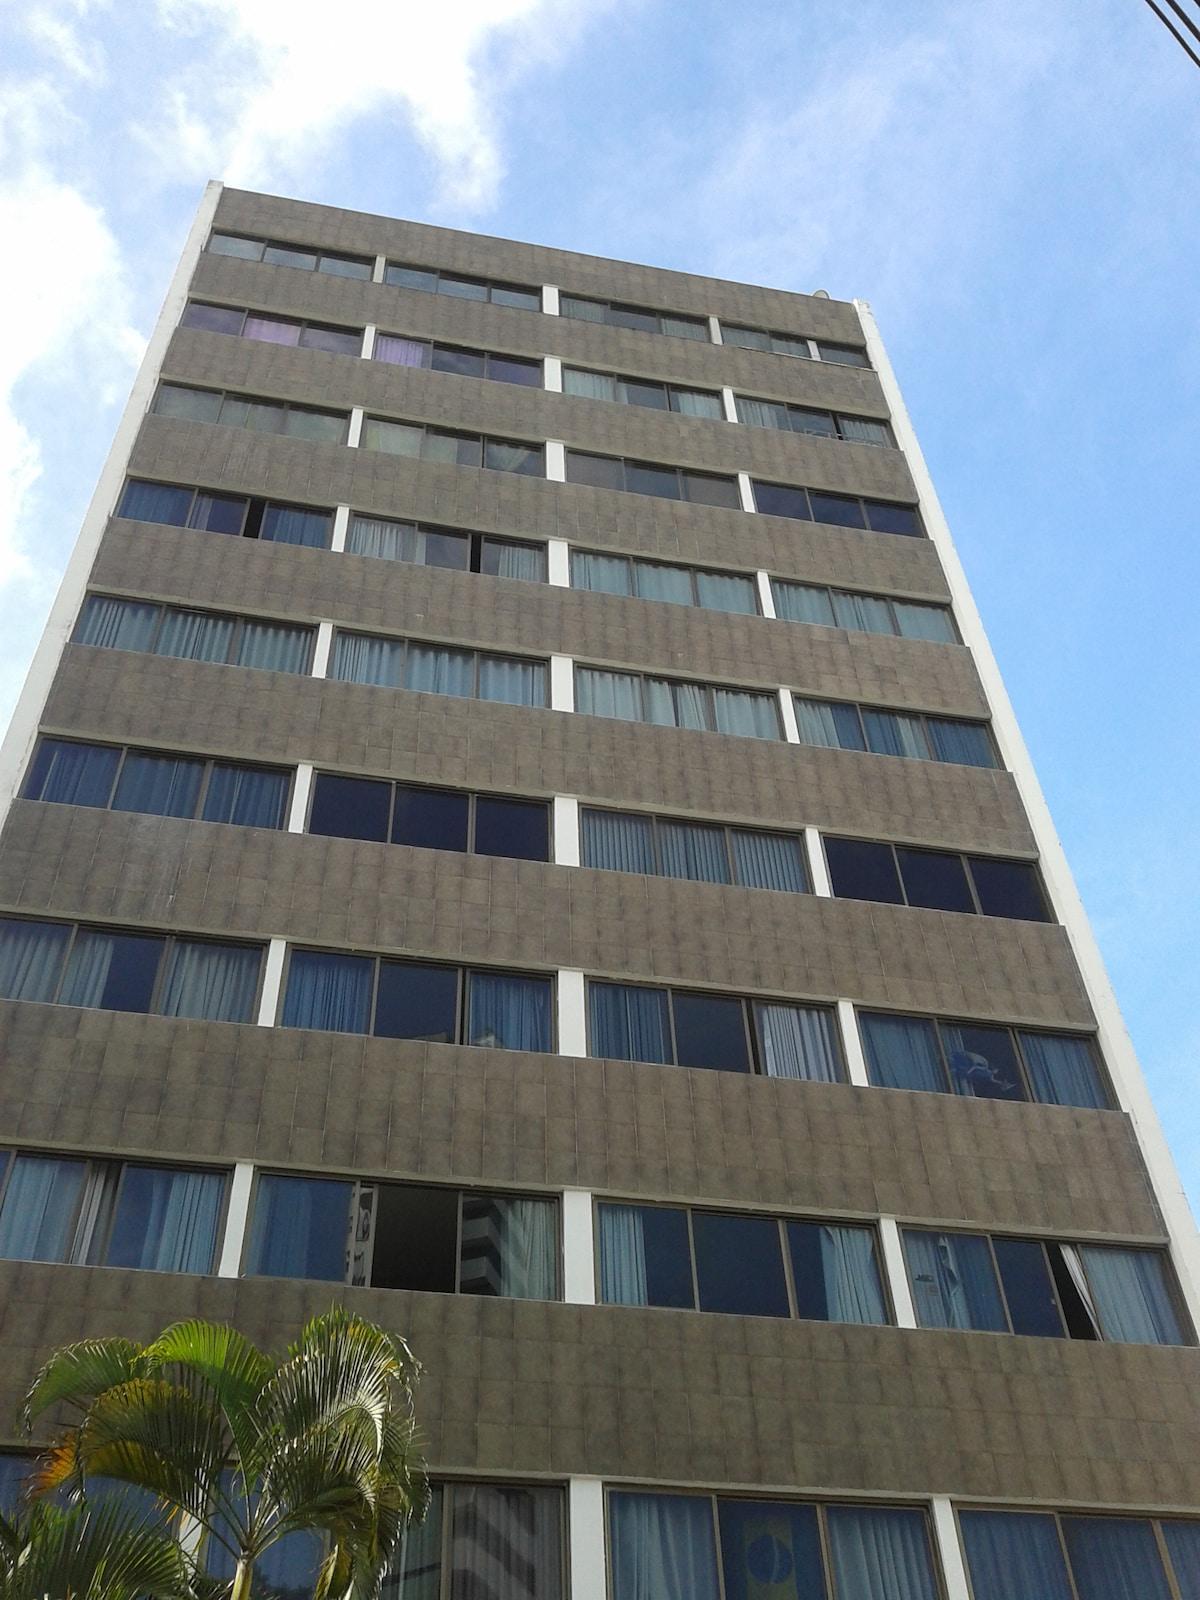 Apart Hotel - CARNAVAL